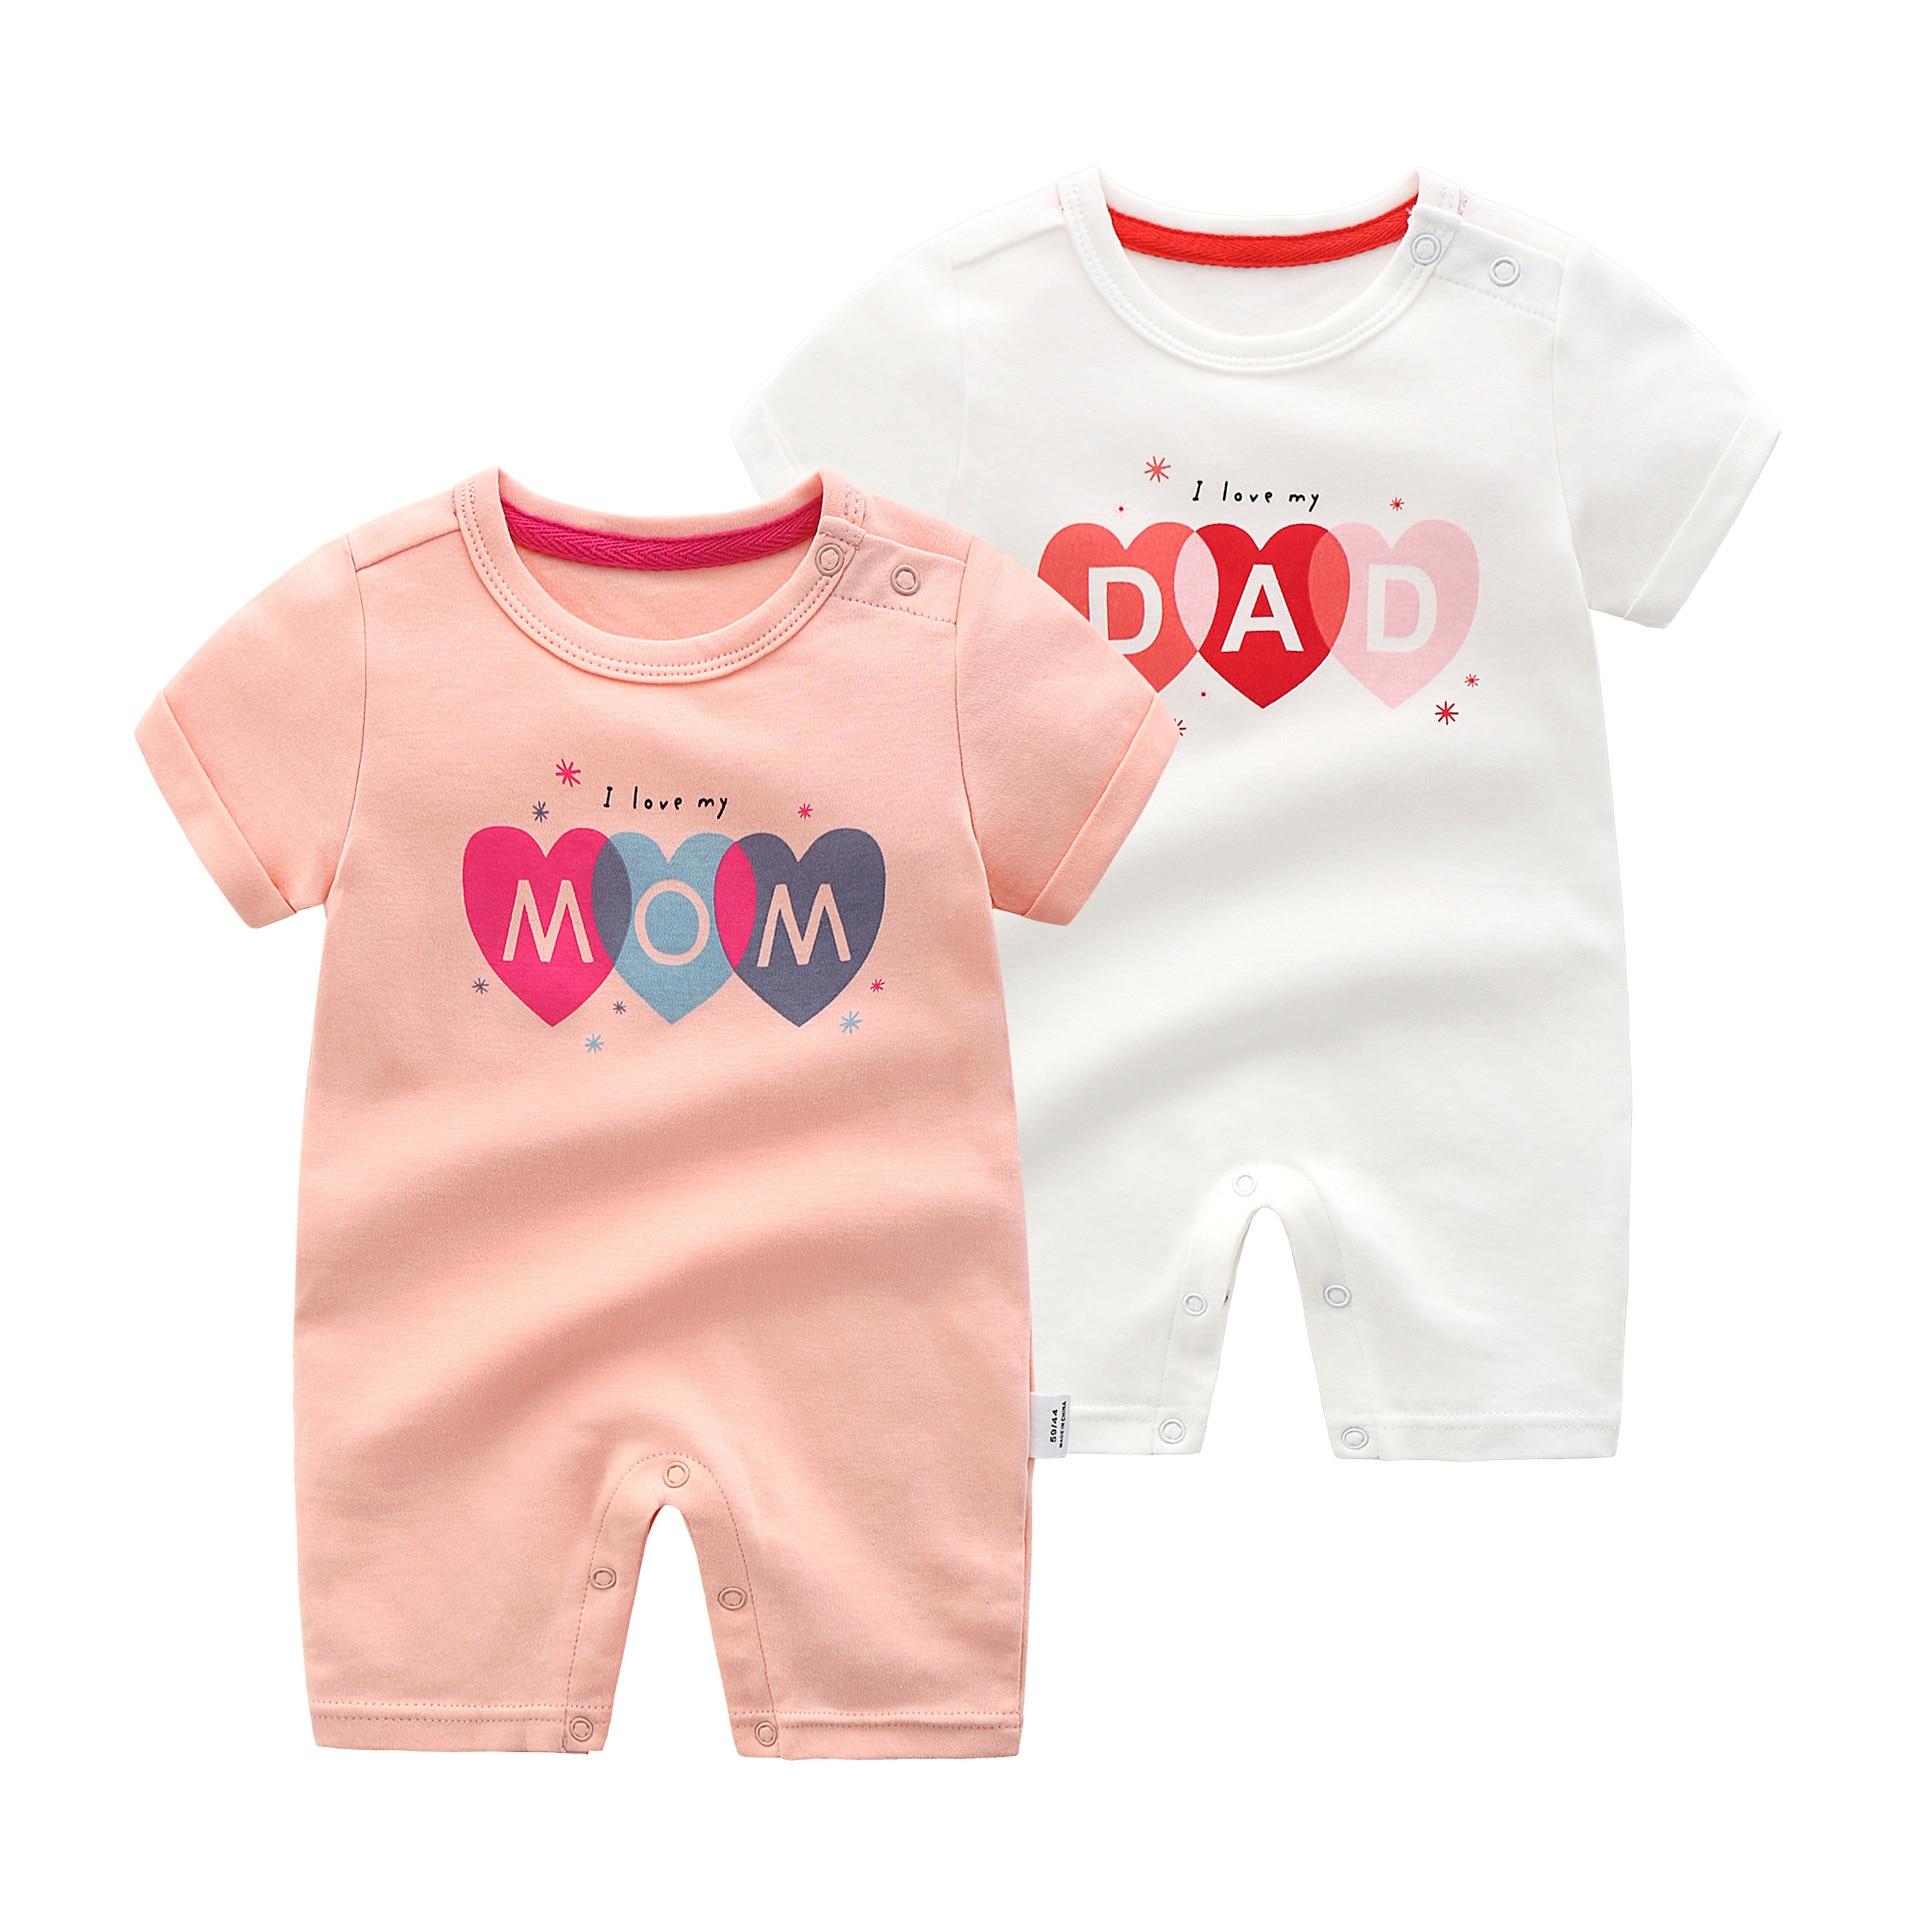 Baby Rompers I Love My Dad Mom Newborn Infant Boys Girls